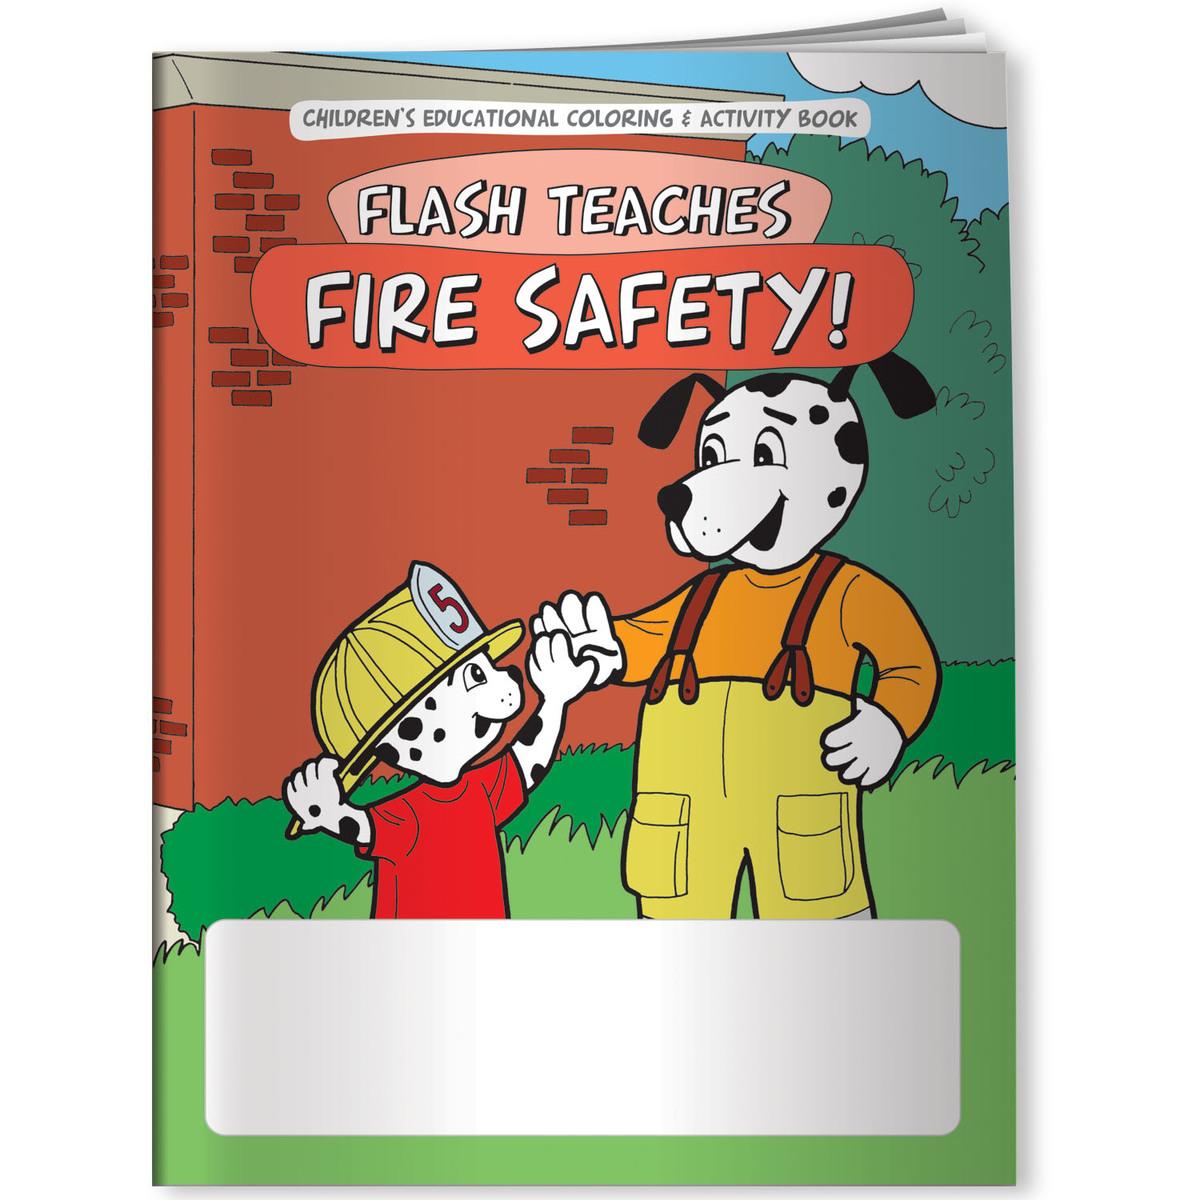 Coloring Book - Flash Teaches Fire Safety! - CB1101 | Ango Promo